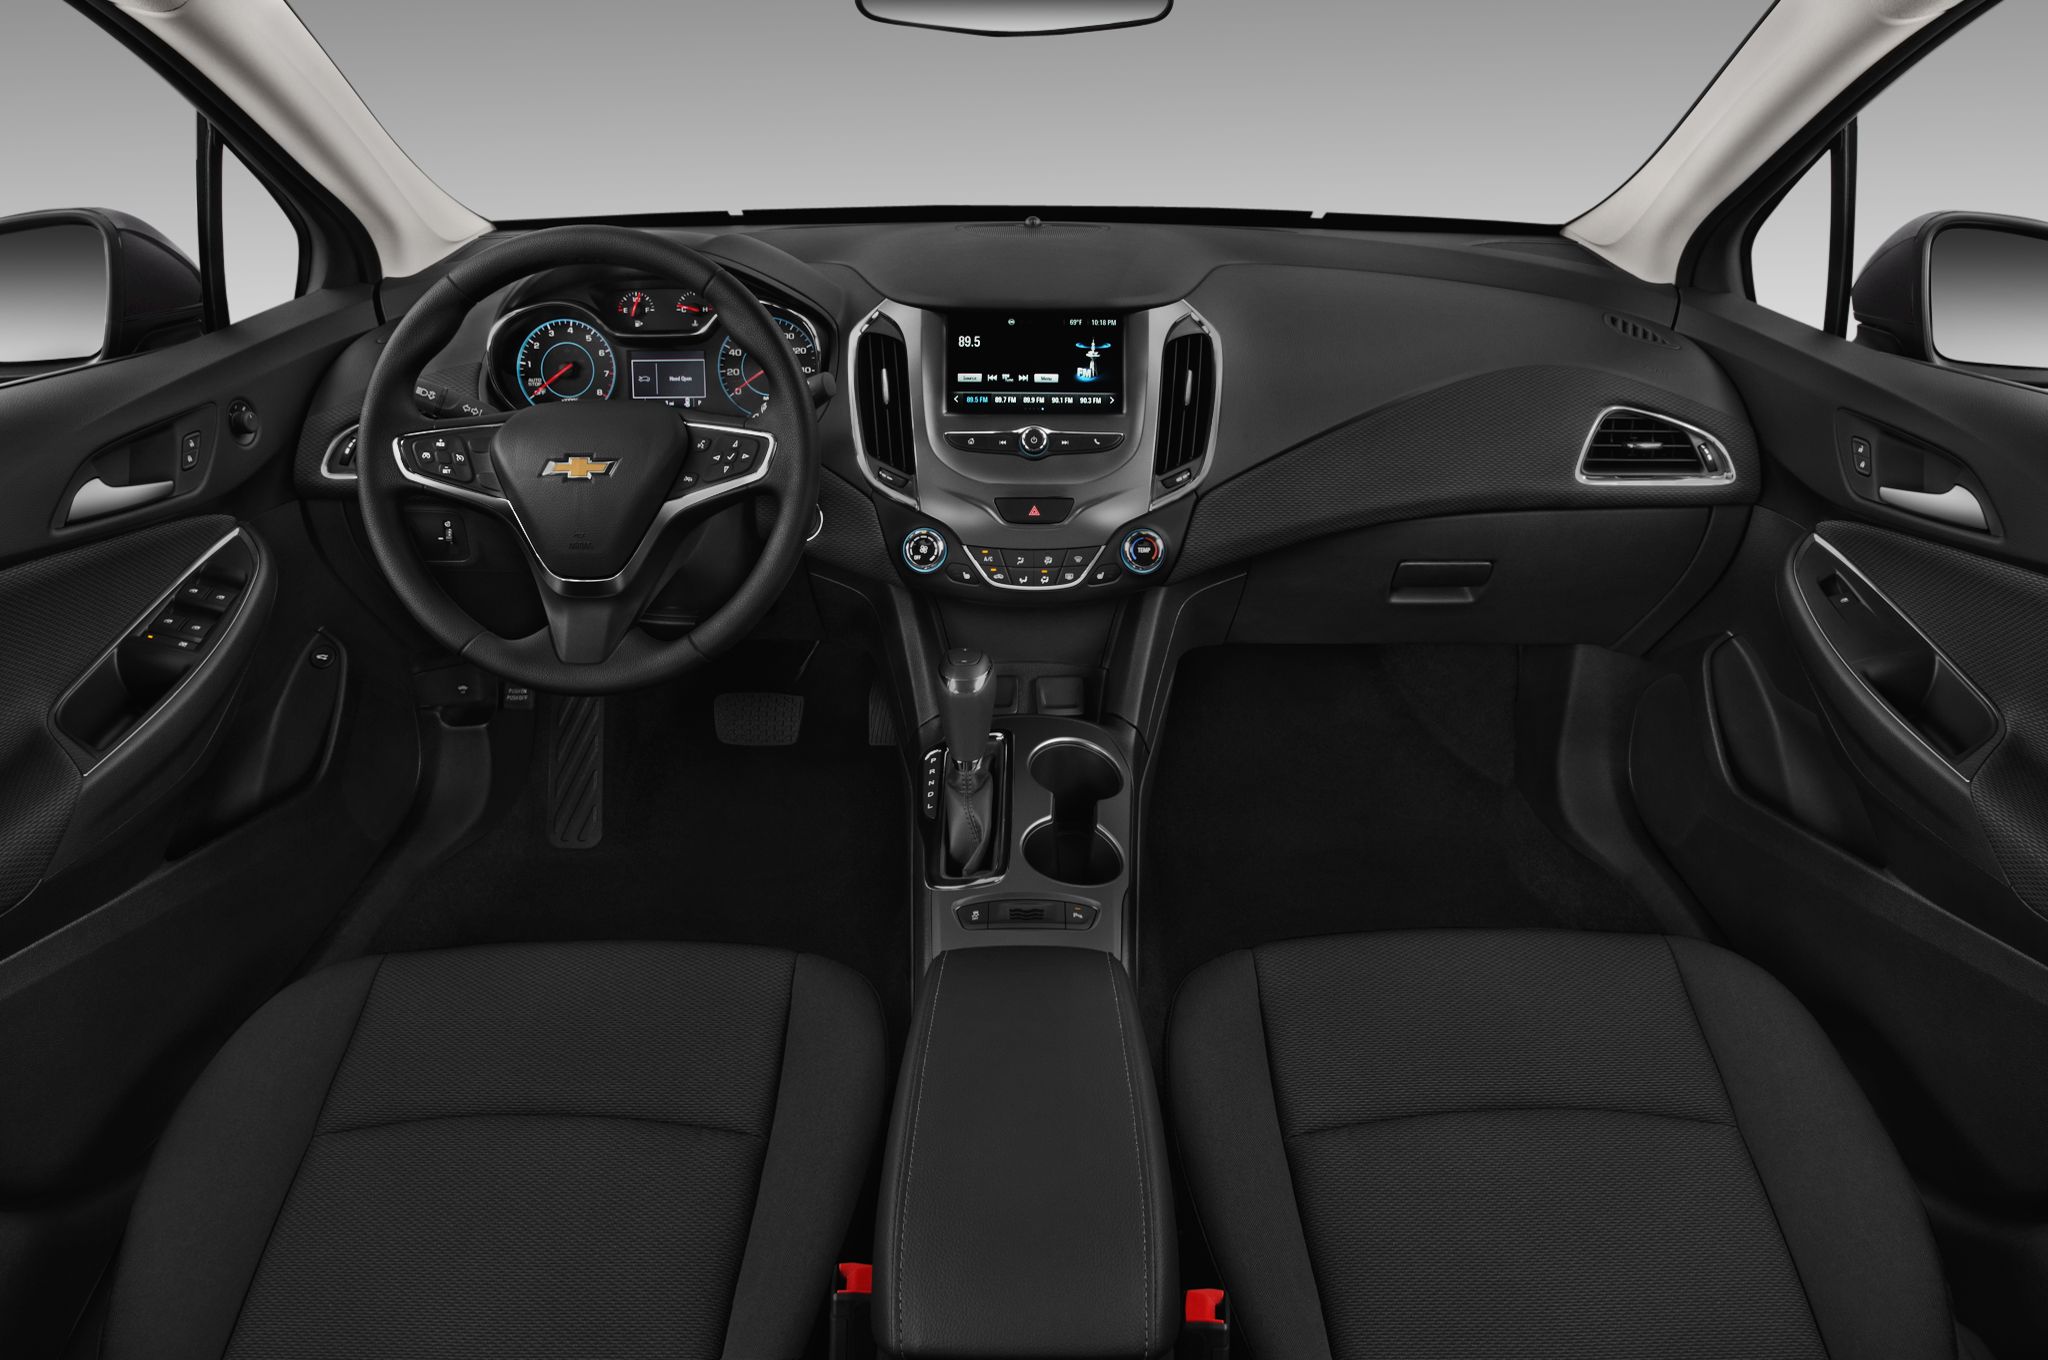 2016 Chevrolet Cruze Undercuts 2016 Honda Civic by Nearly $2,000